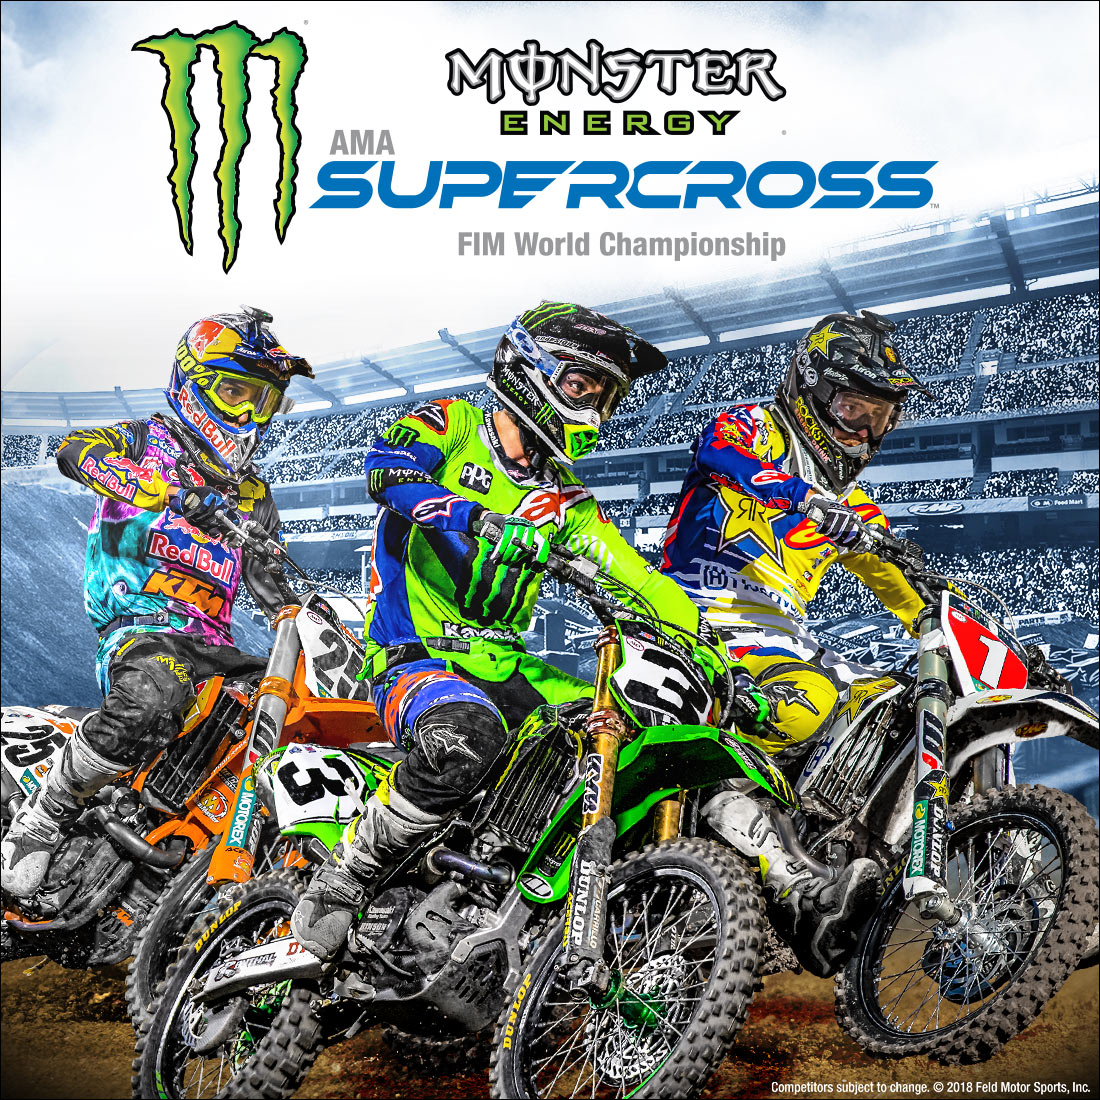 Calendrier Ama Supercross 2019.Unlvtickets 2019 Monster Energy Supercross